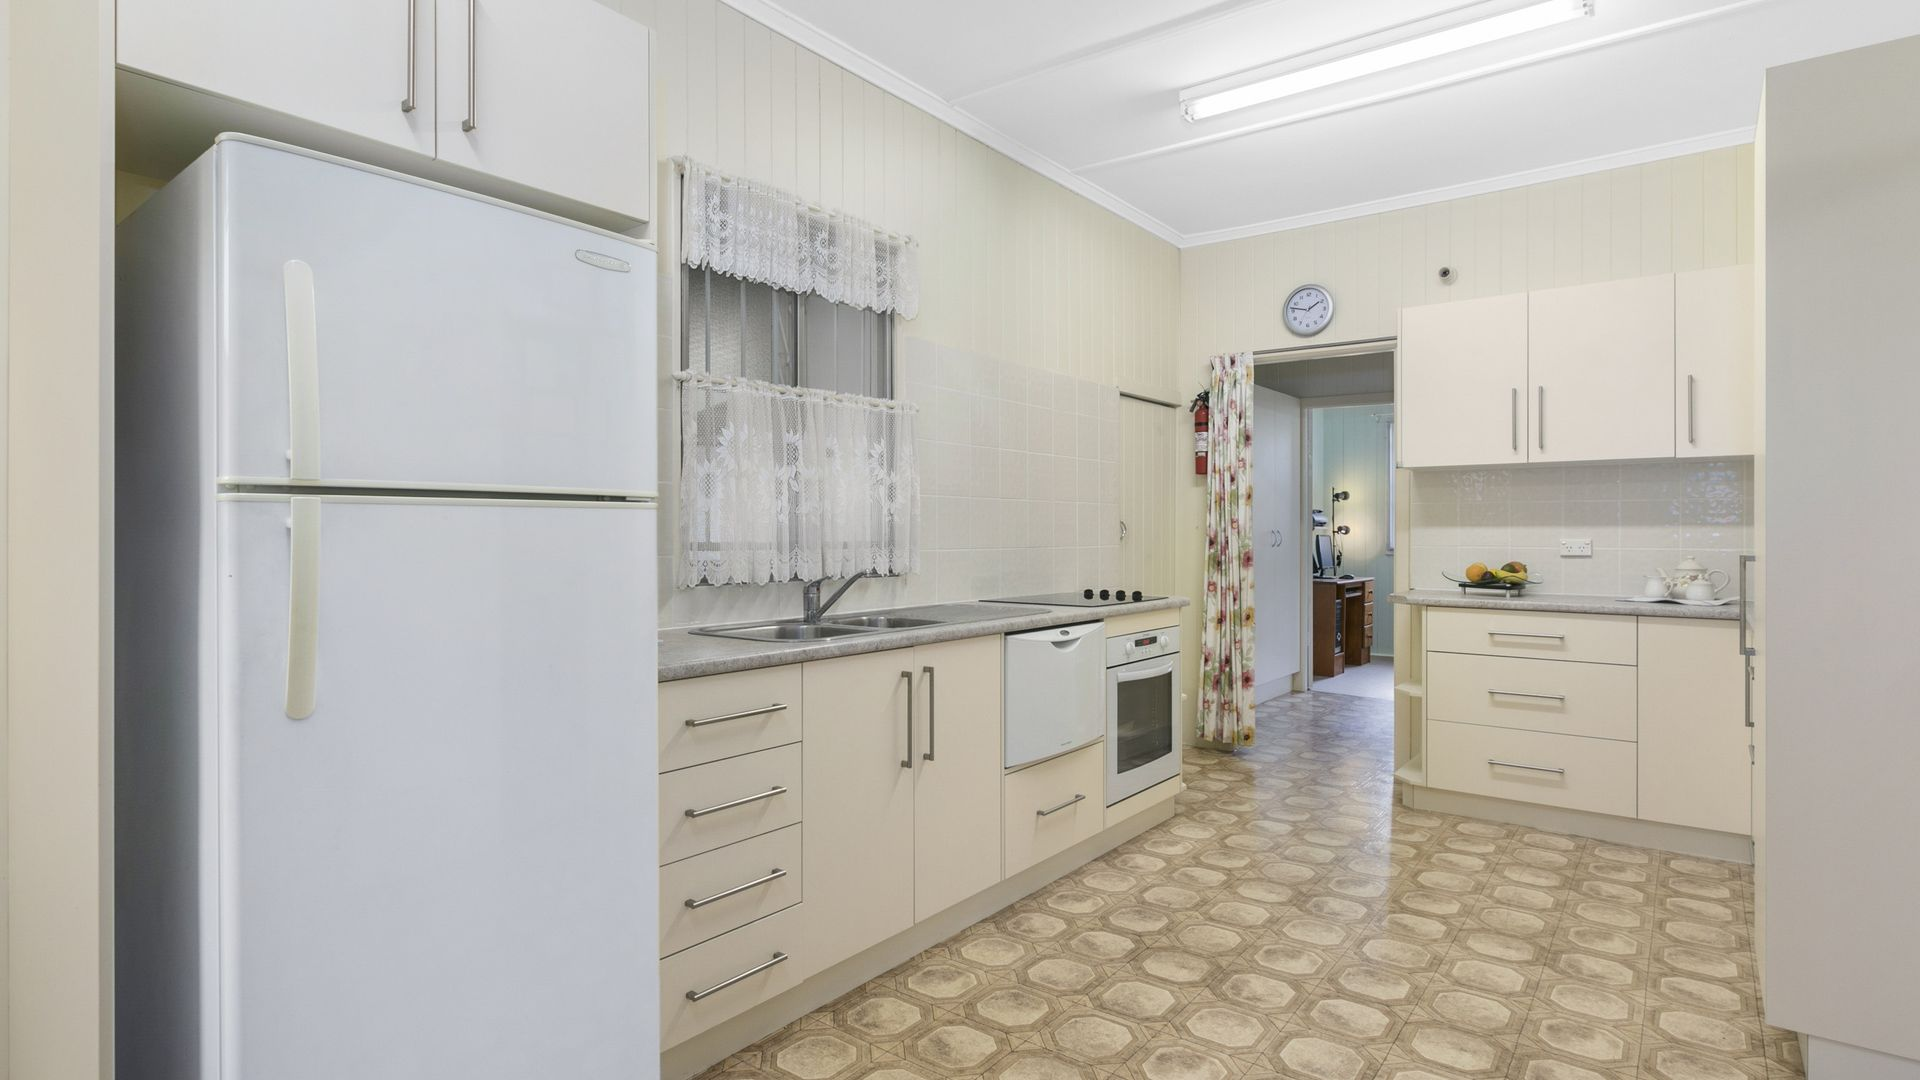 3 Eric Street, Nambour QLD 4560, Image 1